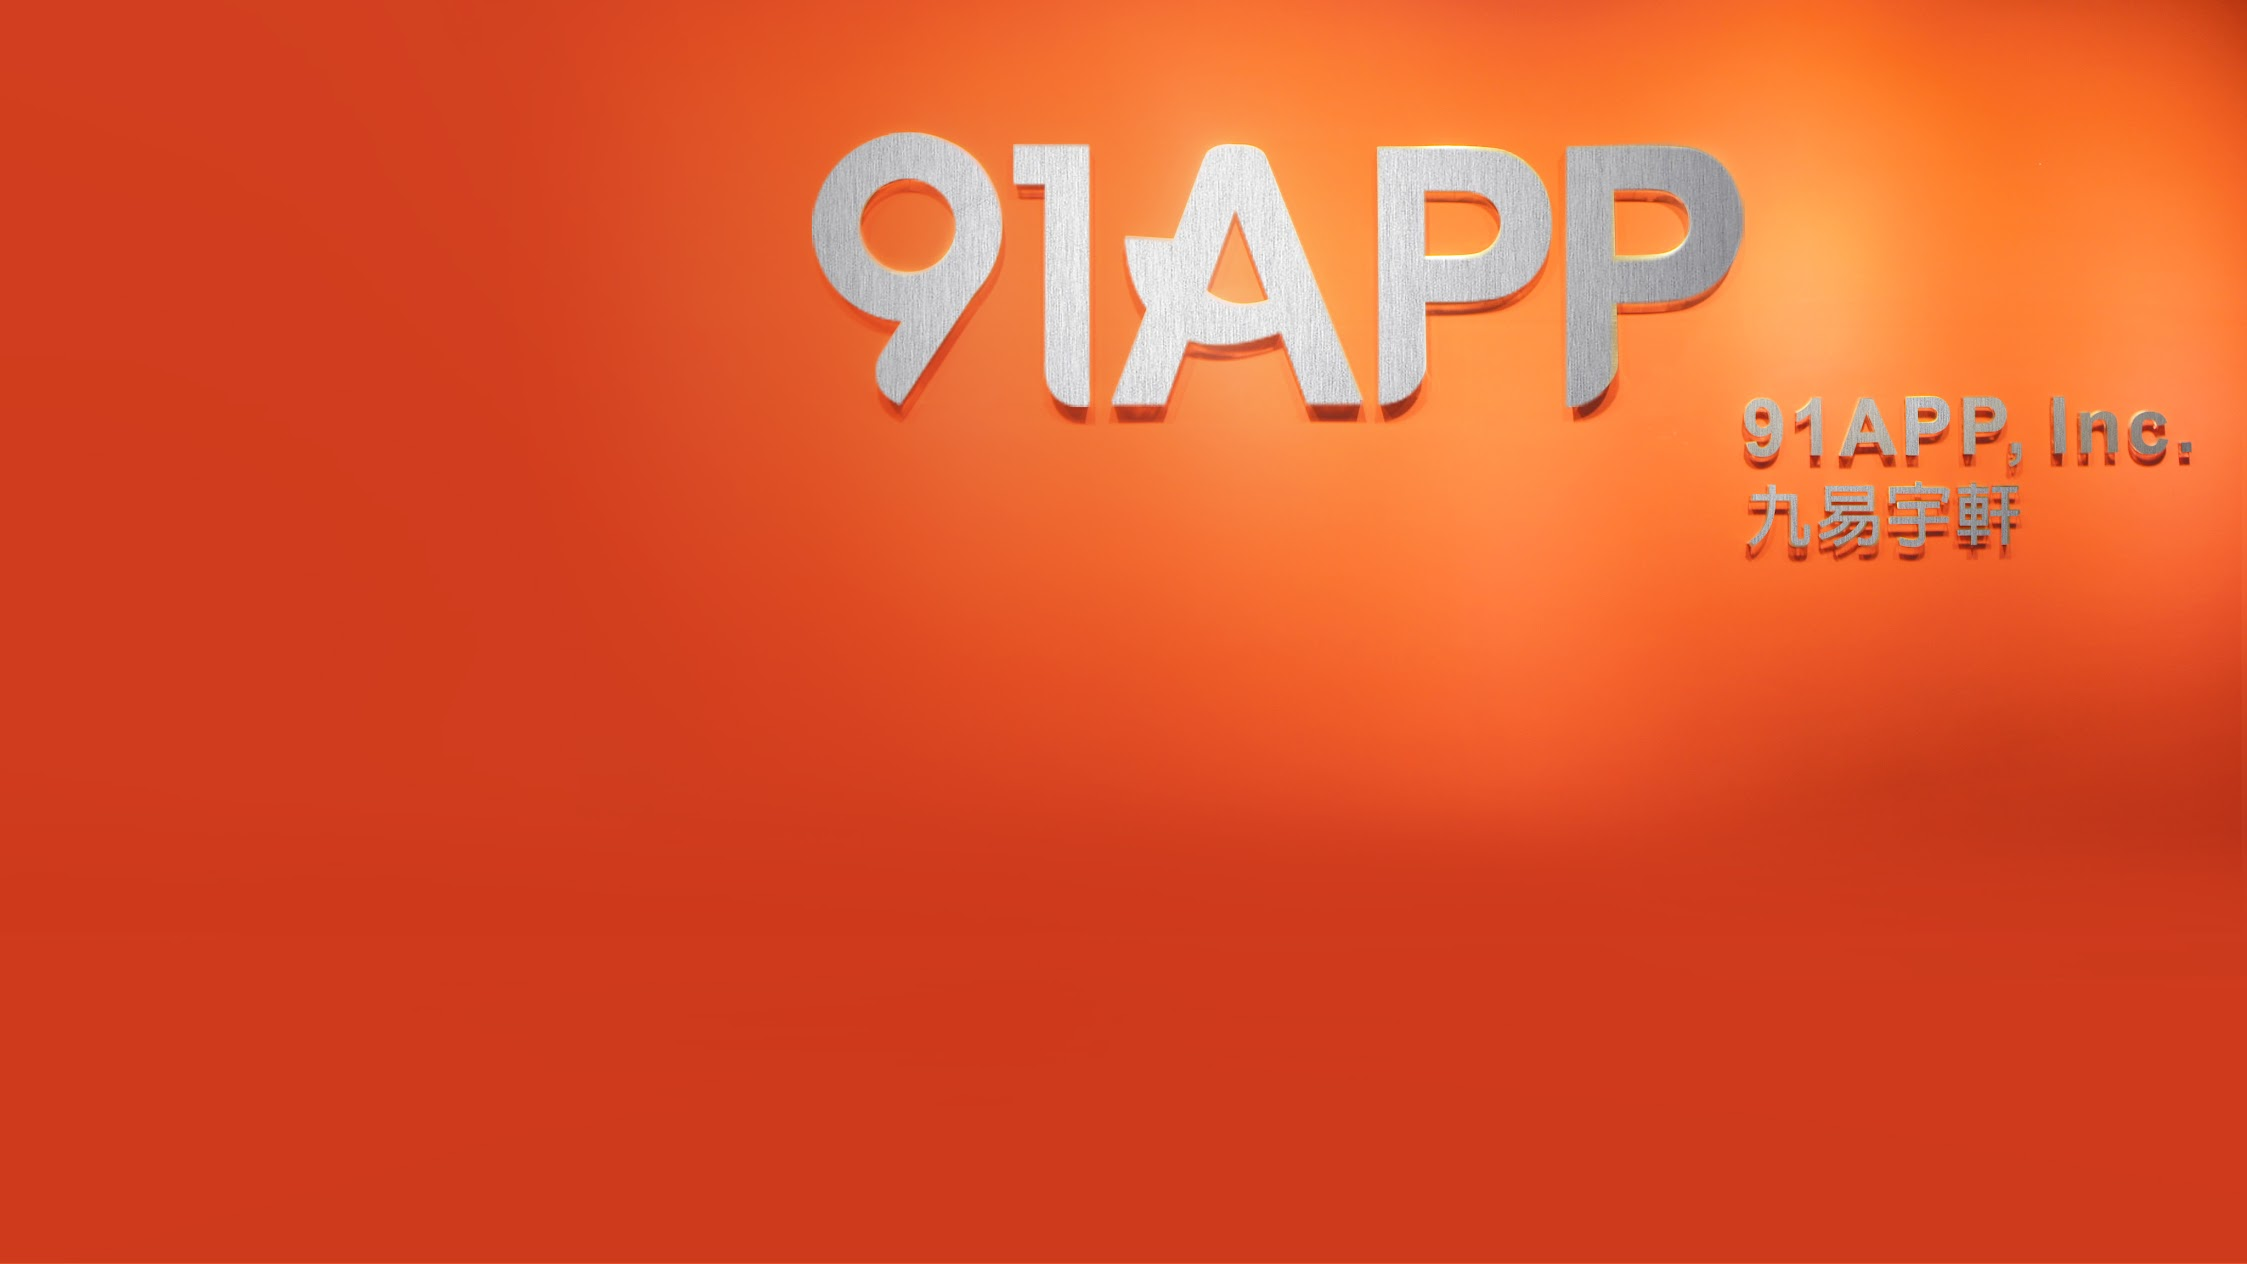 91APP, Inc.